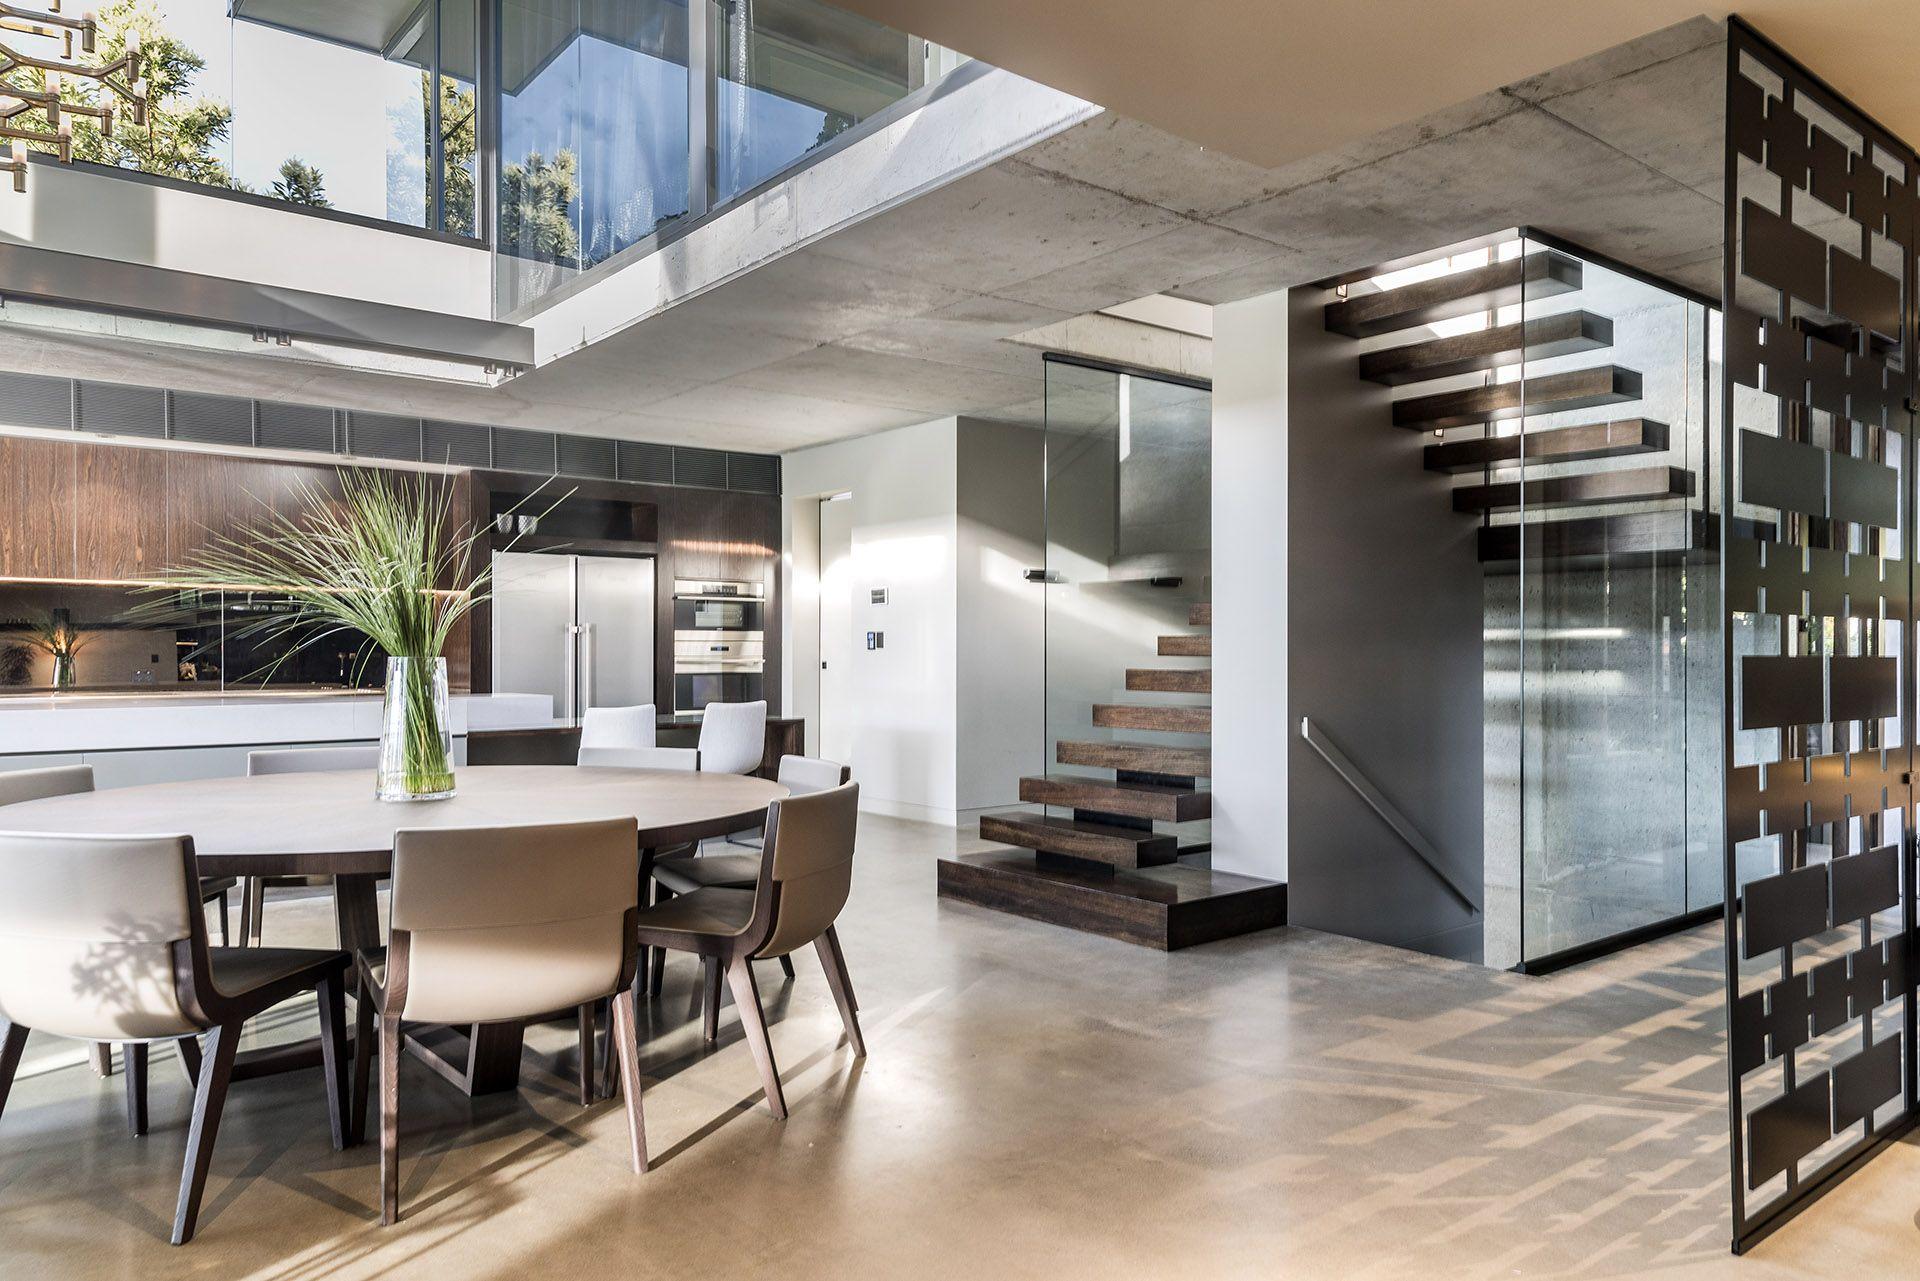 Ozgrind Polished Concrete Home Kitchen Architect Design